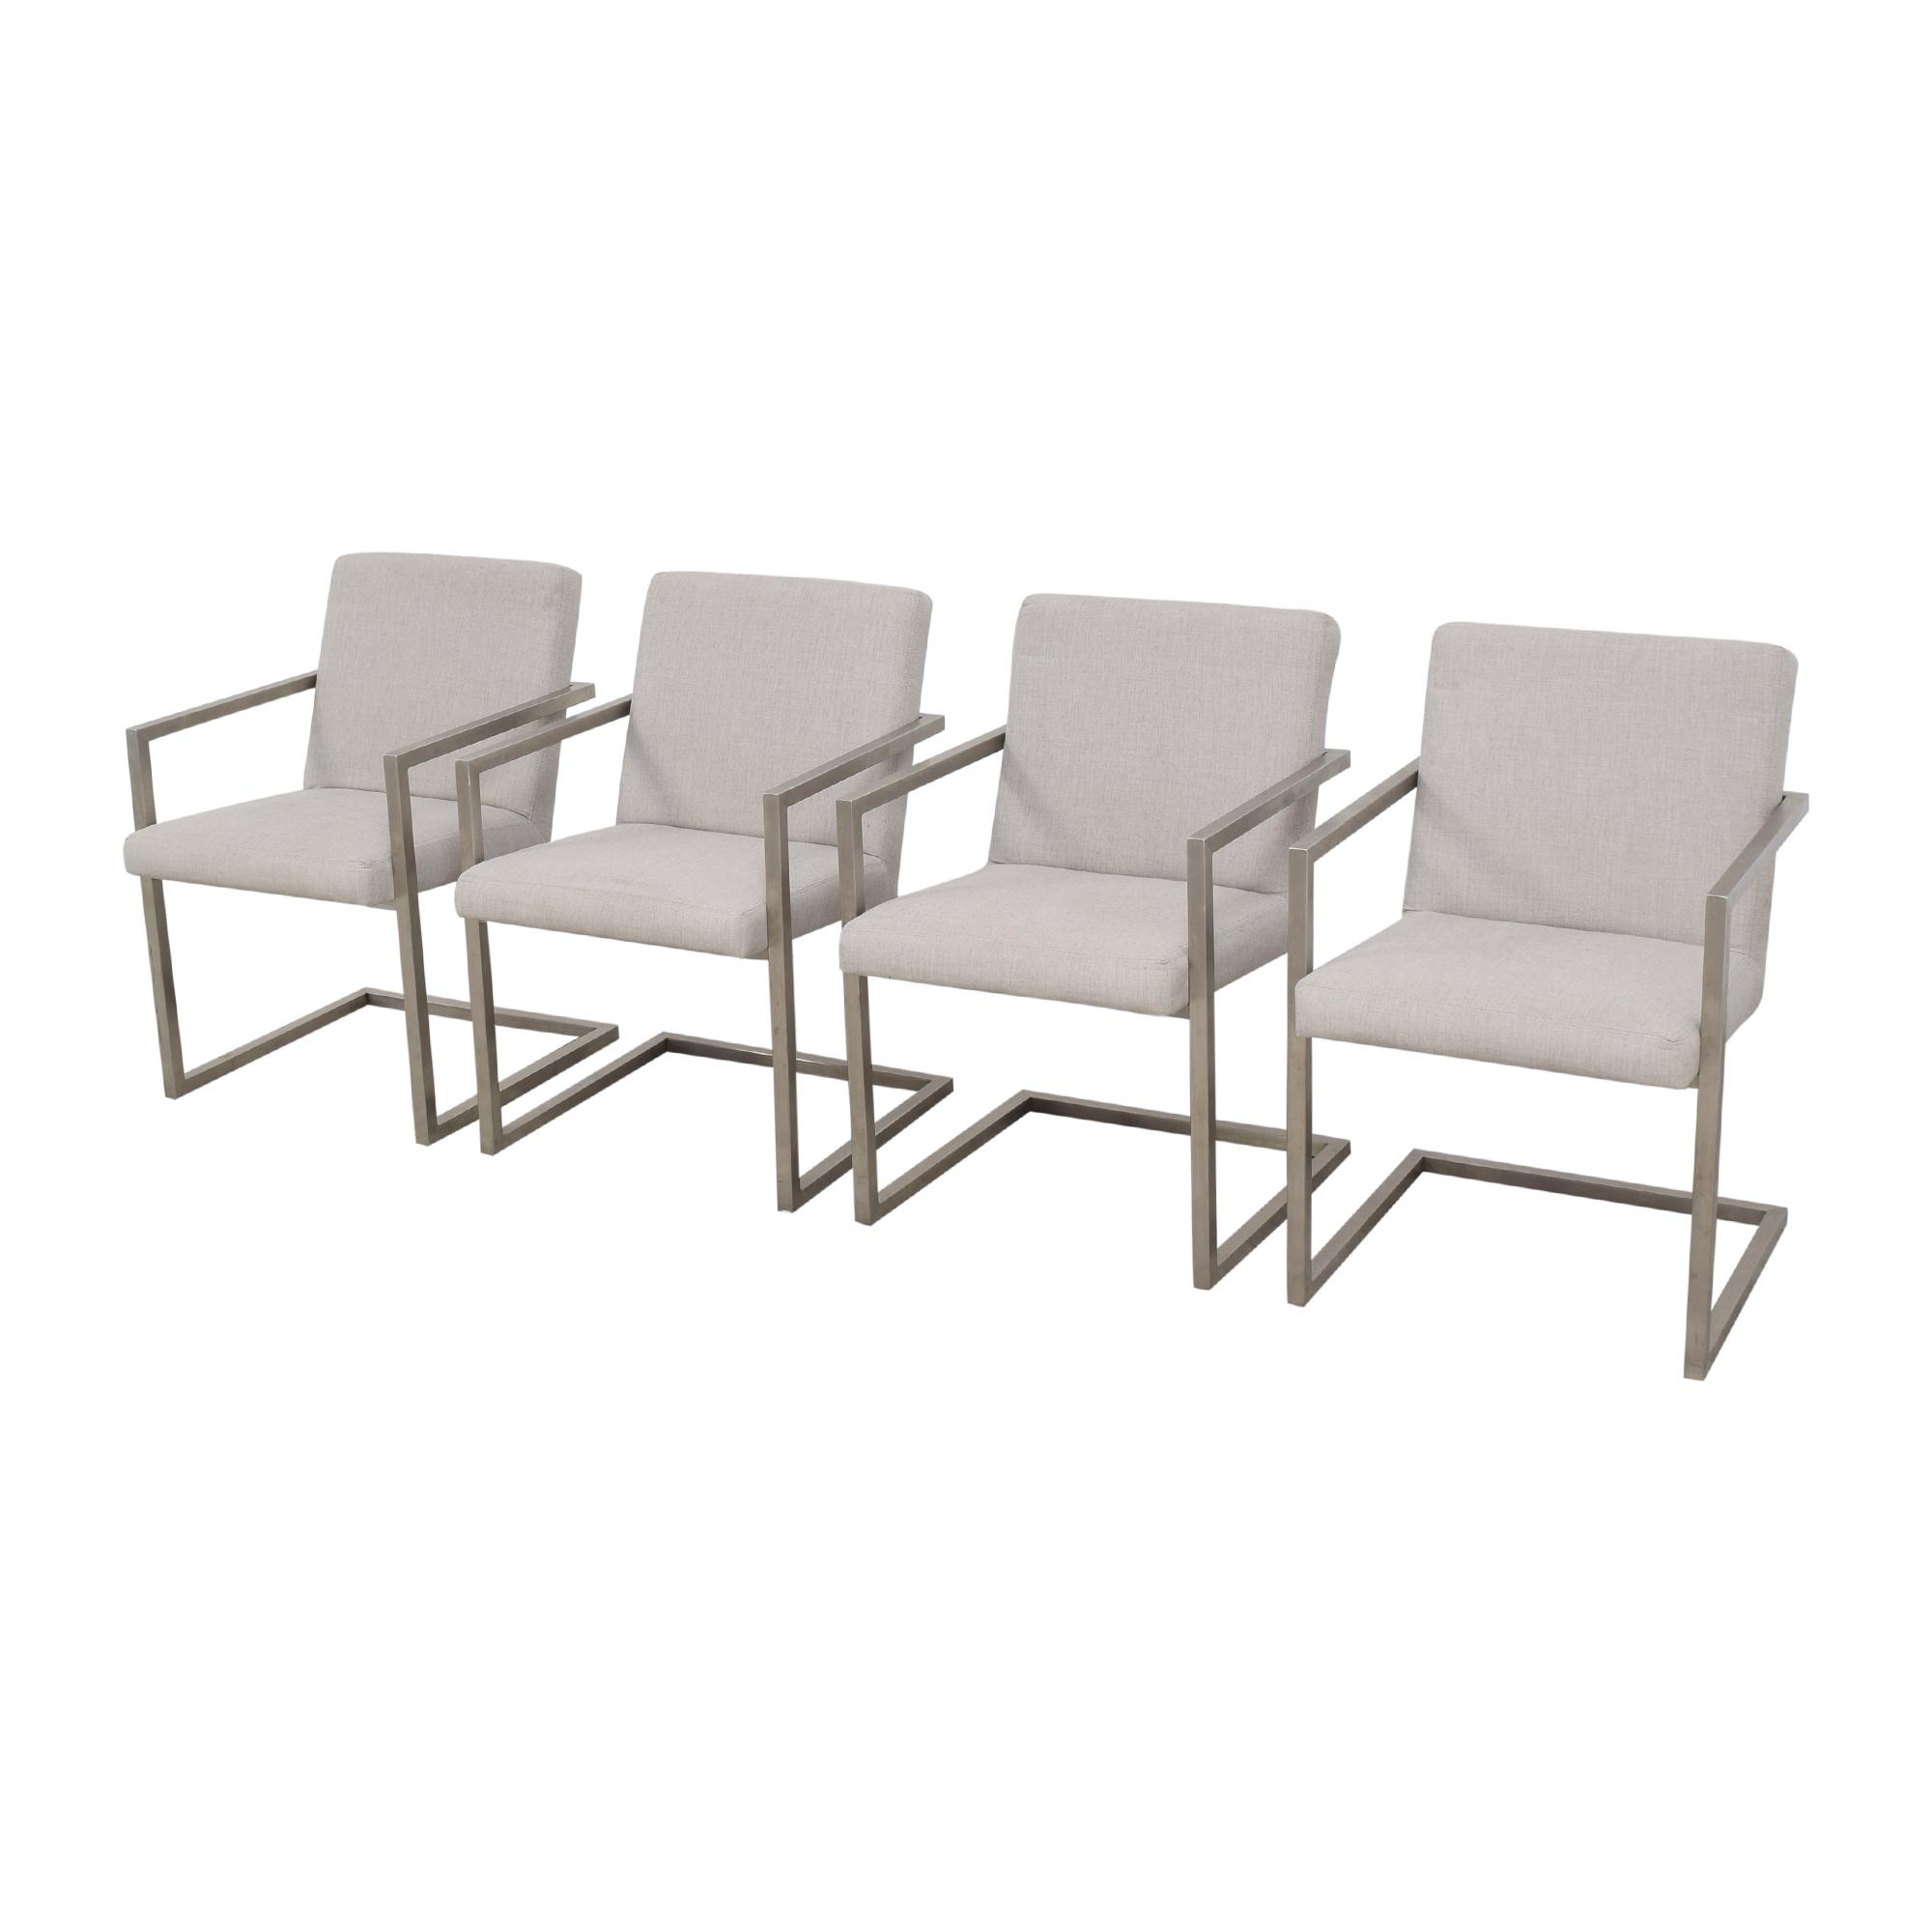 shop Room & Board Lira Dining Arm Chairs Room & Board Chairs